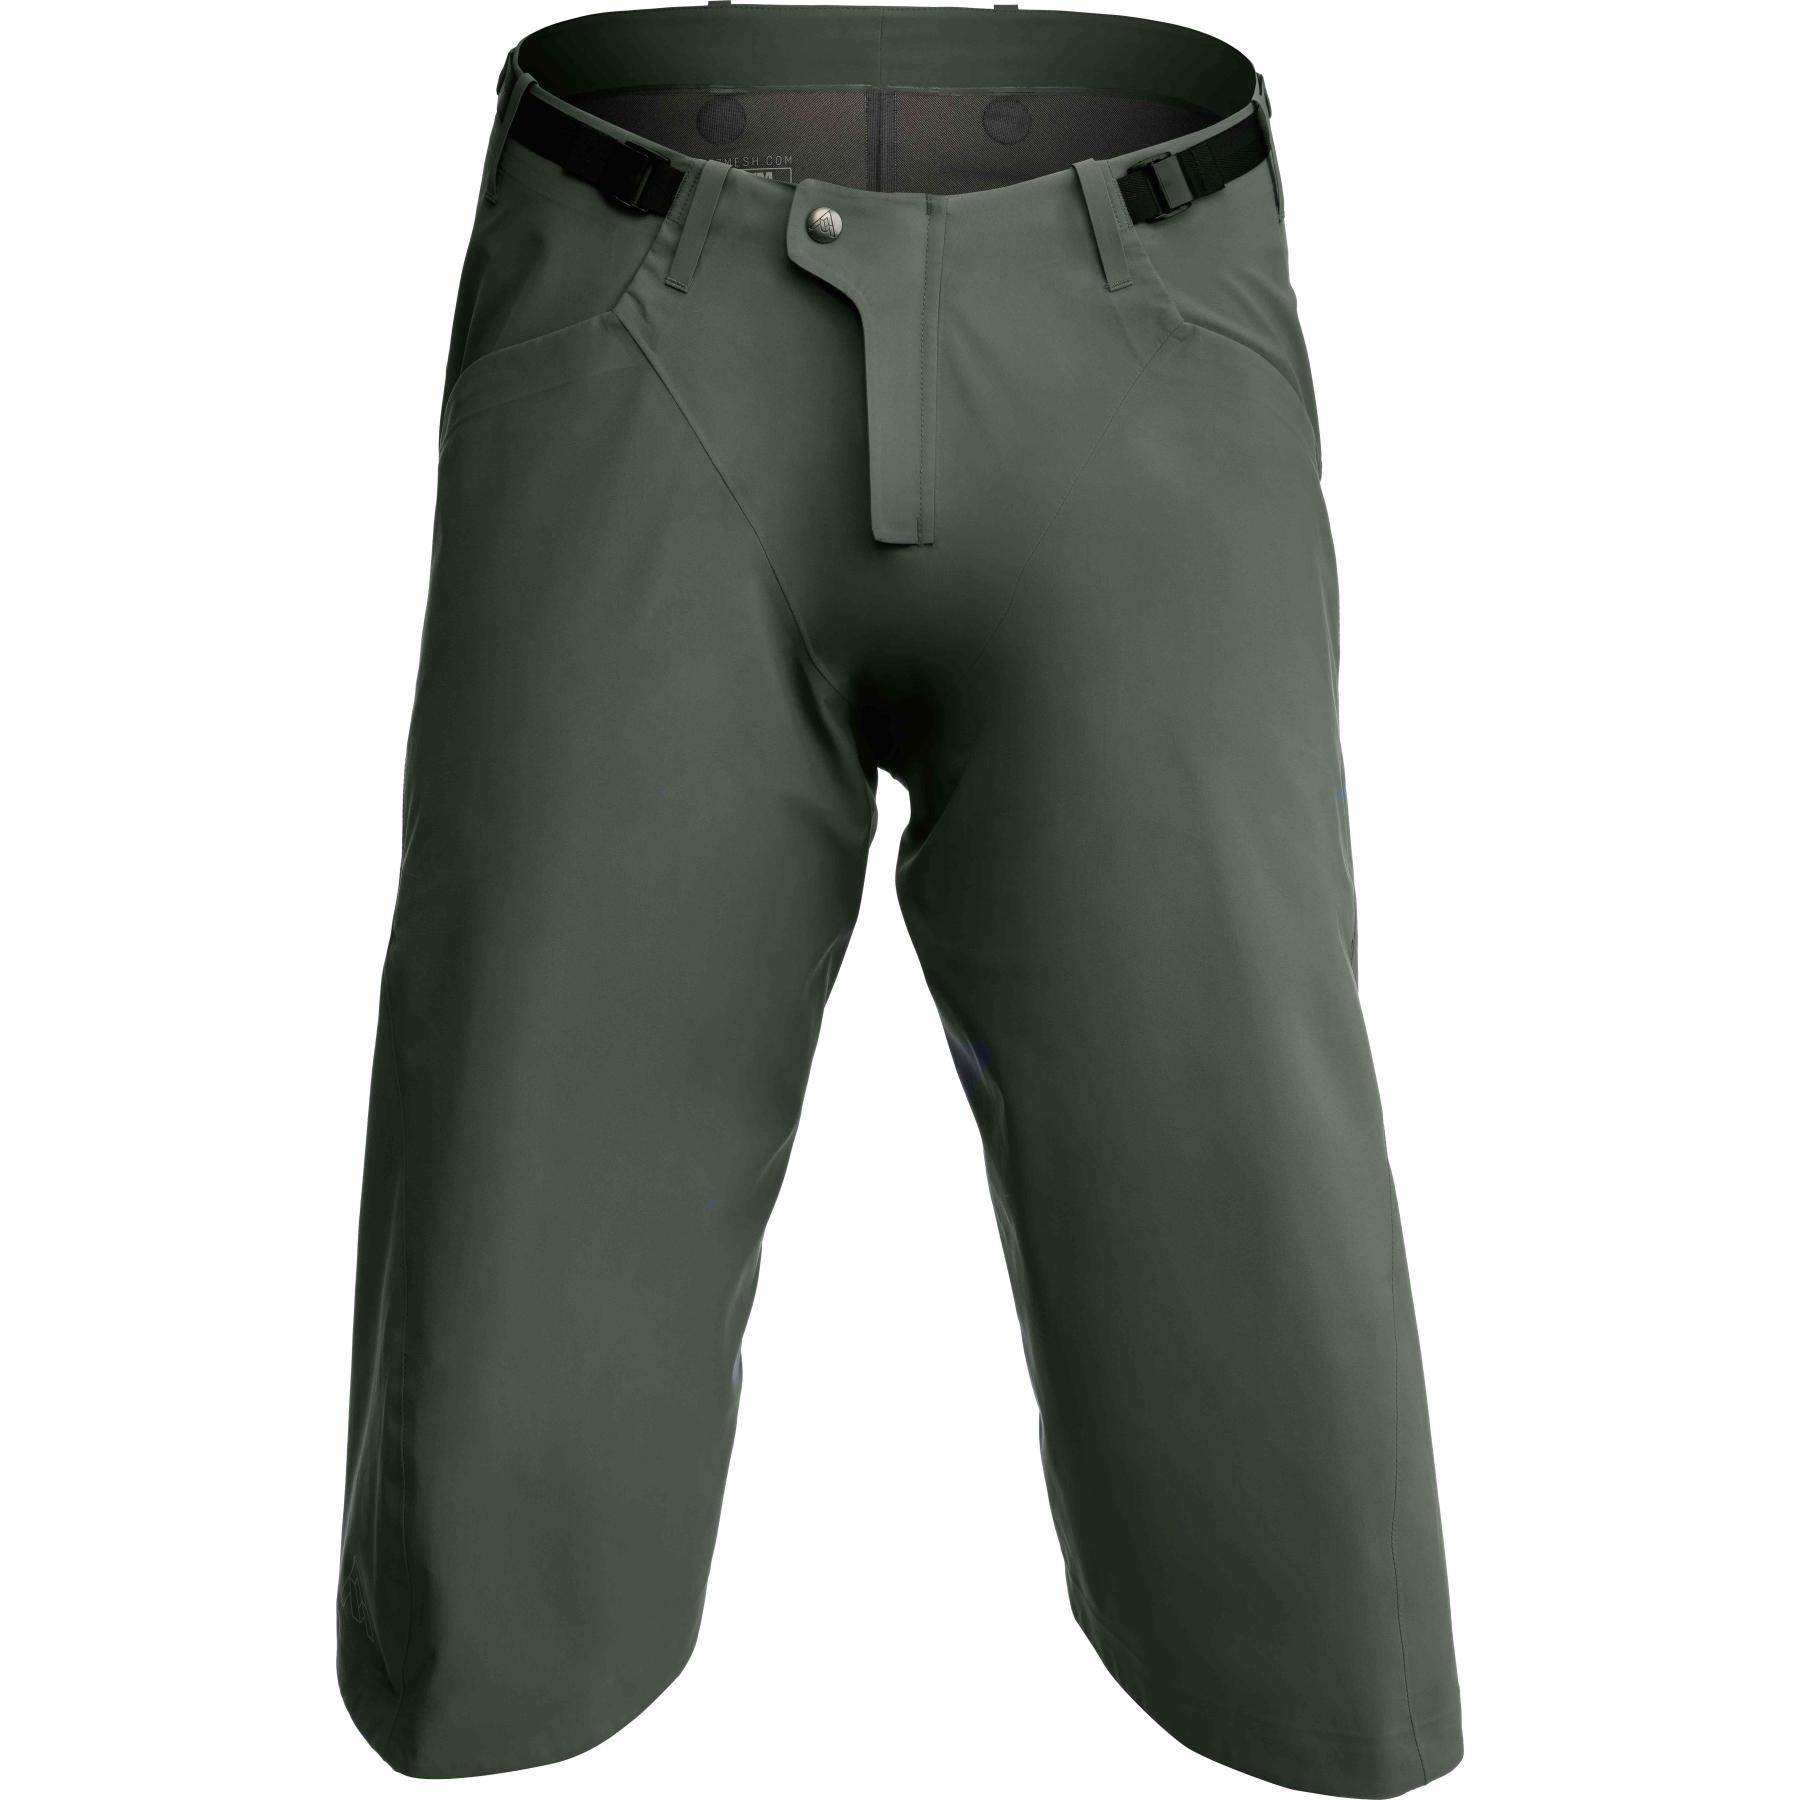 7mesh Revo Pantalones Cortos - thyme